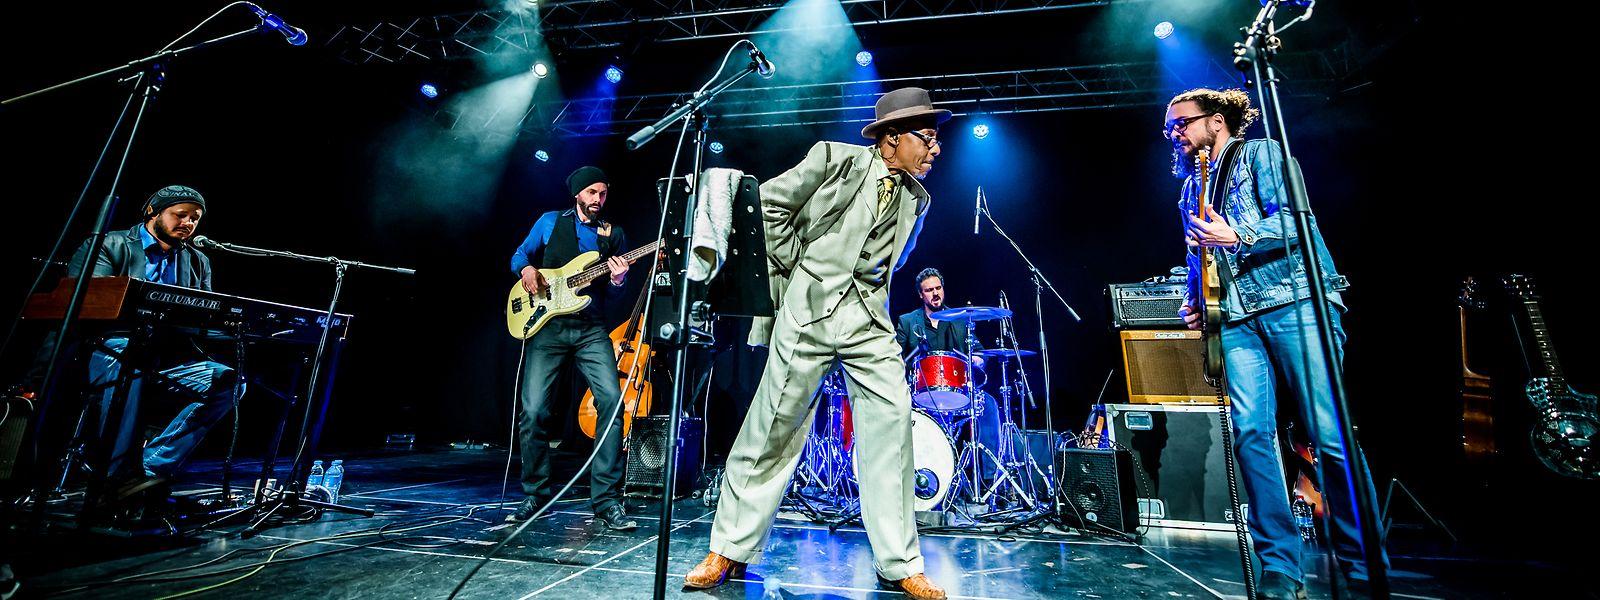 Archie Lee Hooker raconte sa vie en chansons.